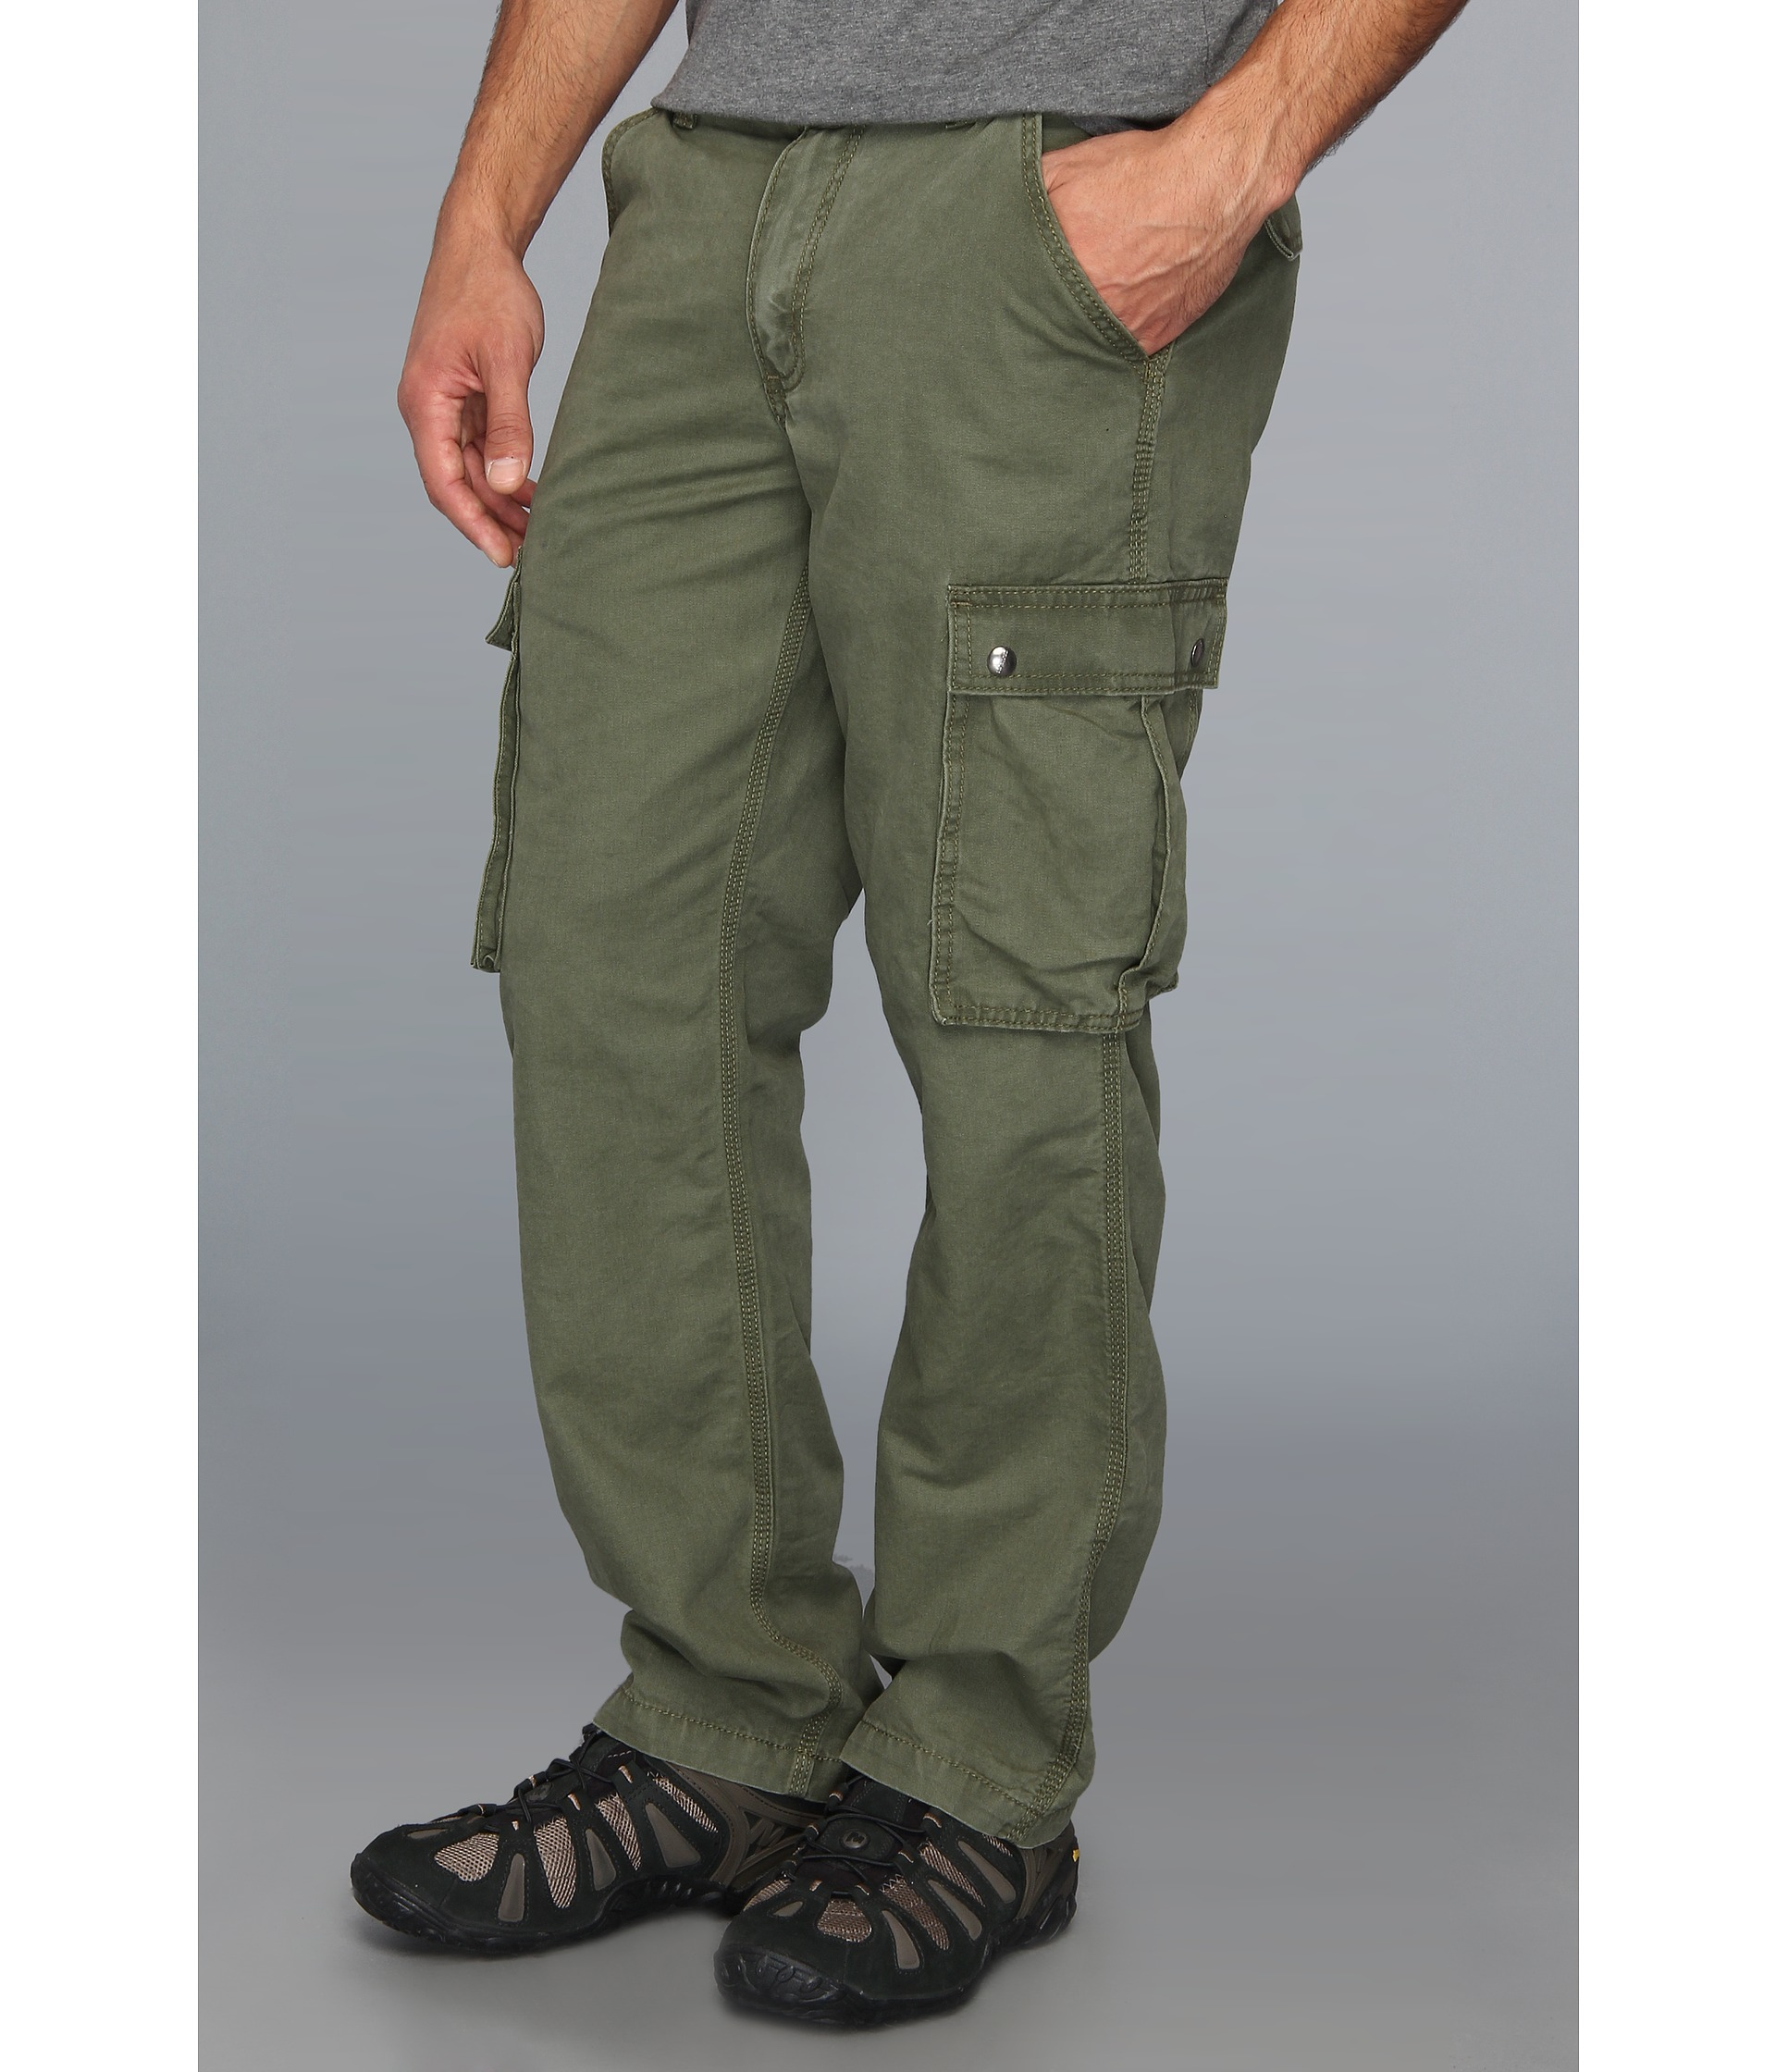 Carhartt Rugged Cargo Pant - 6pm.com